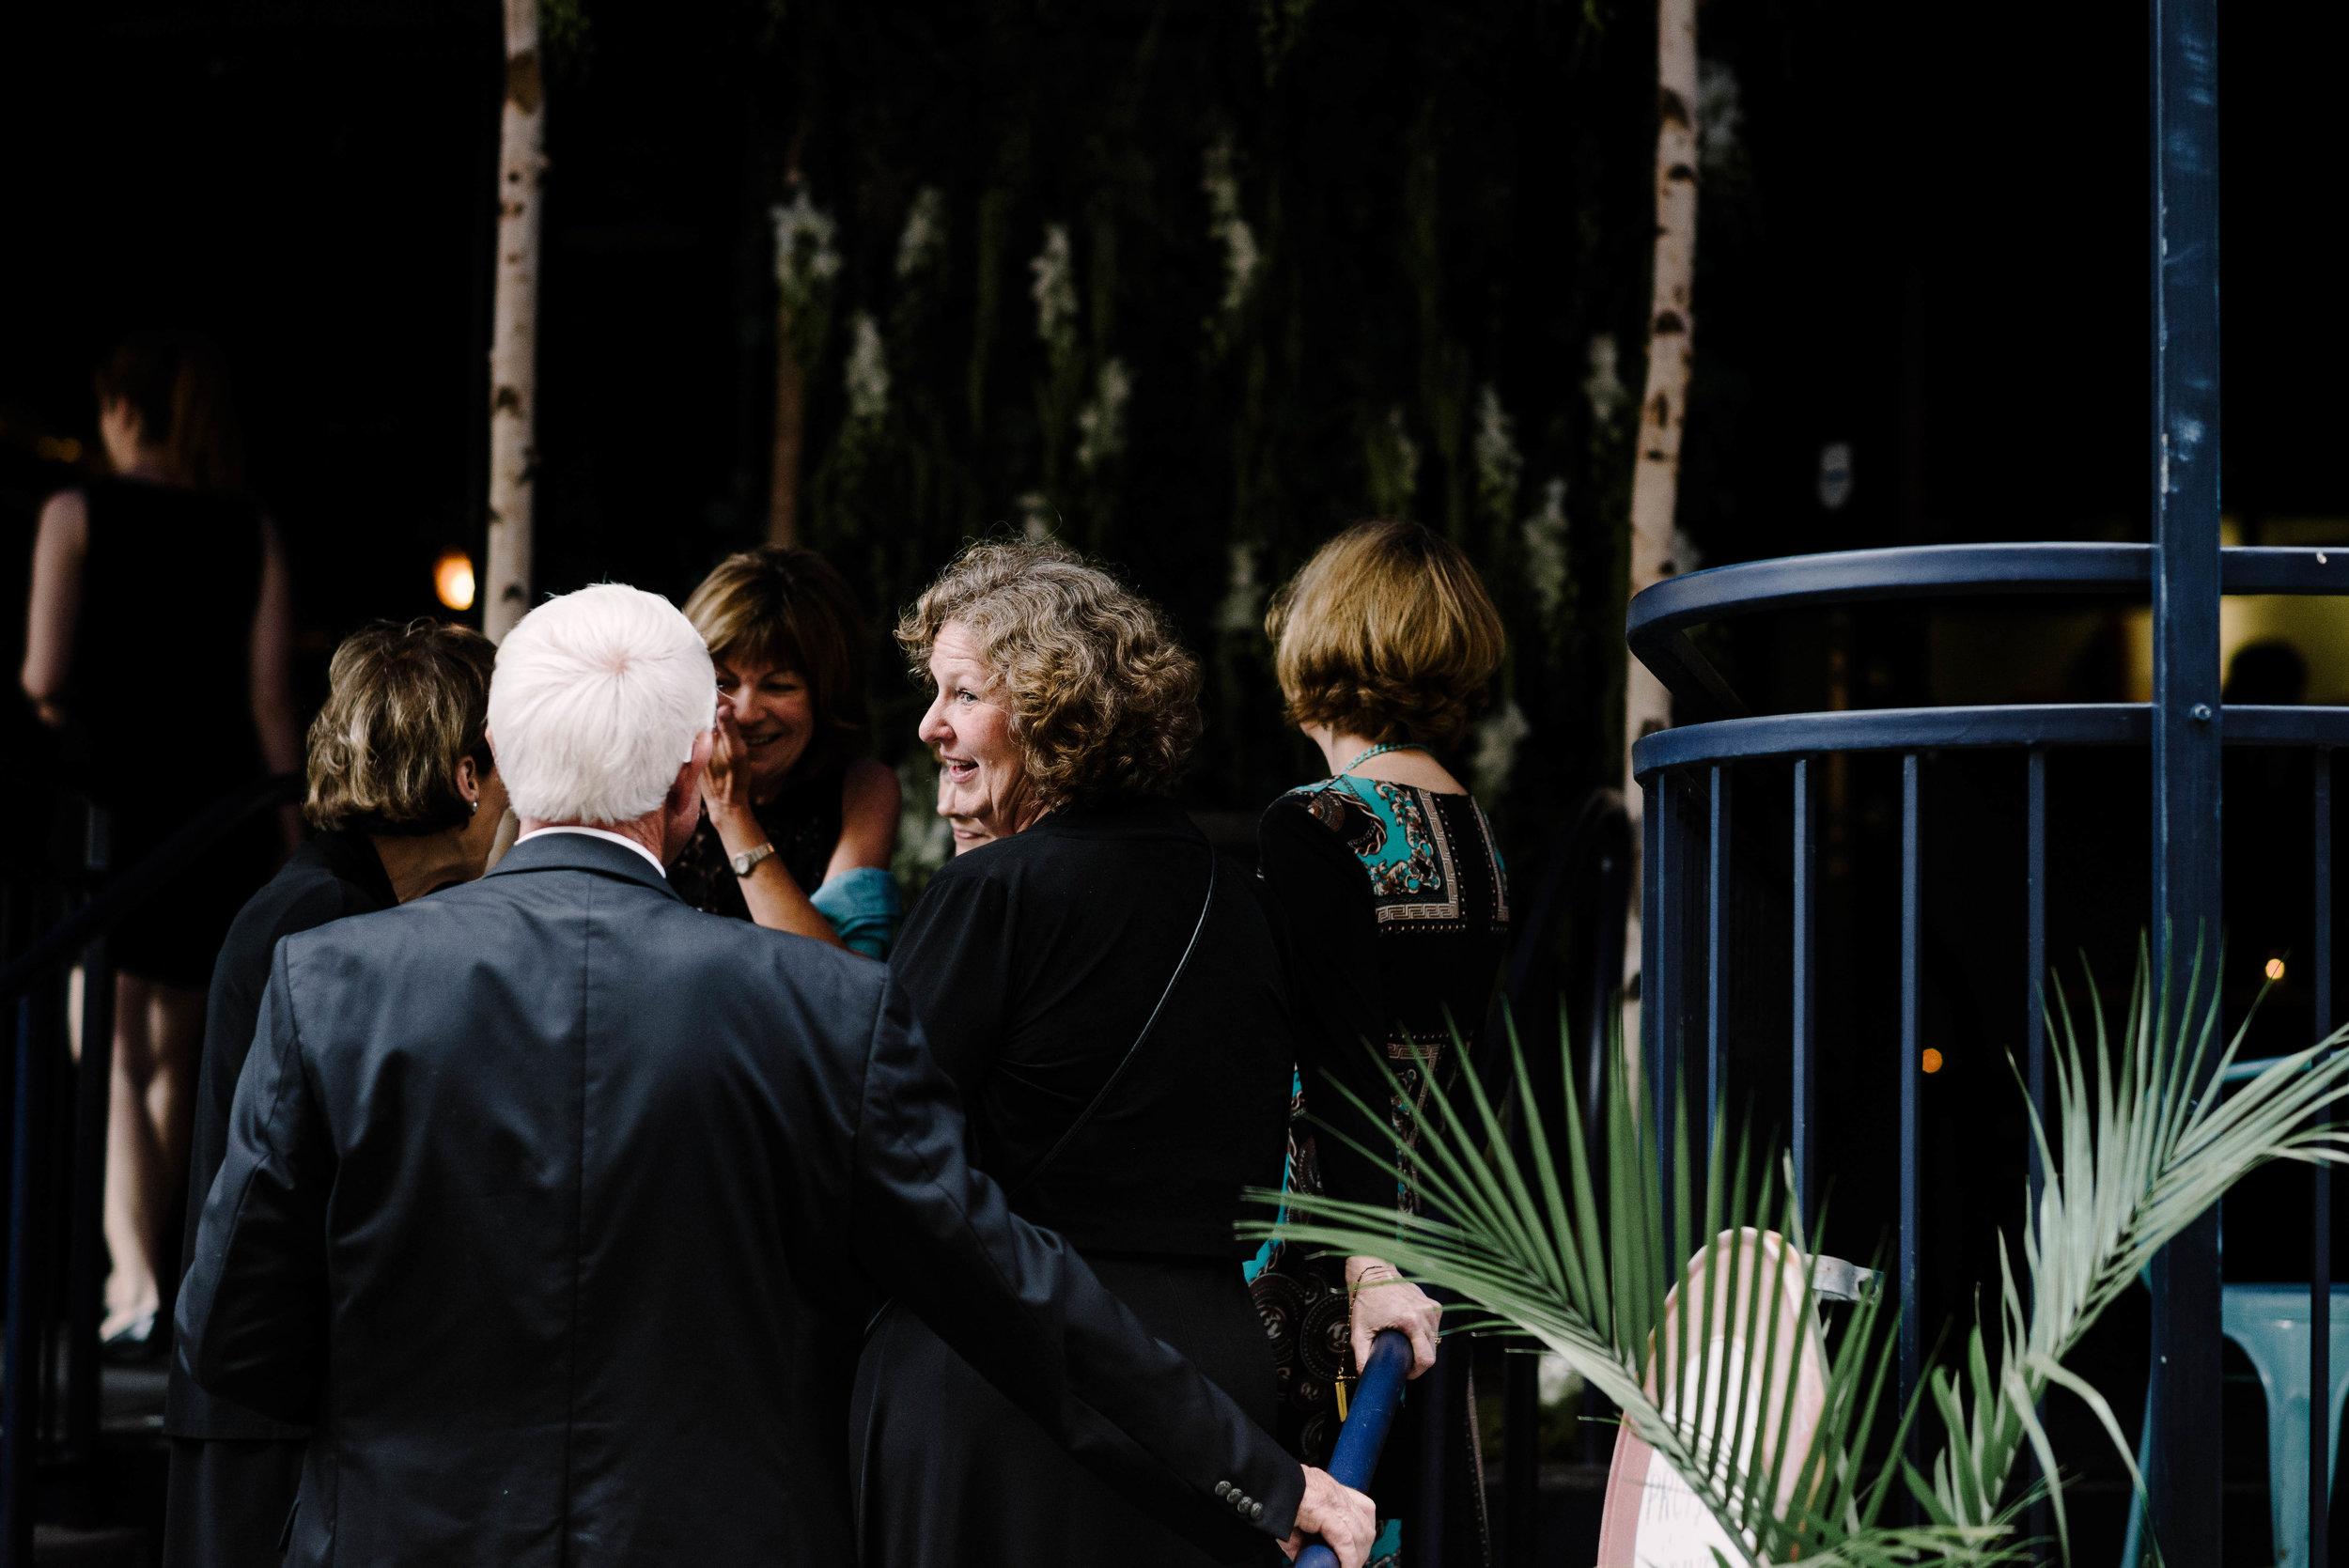 Patricia-Steve-Blog-Indianapolis-Wedding-77.jpg